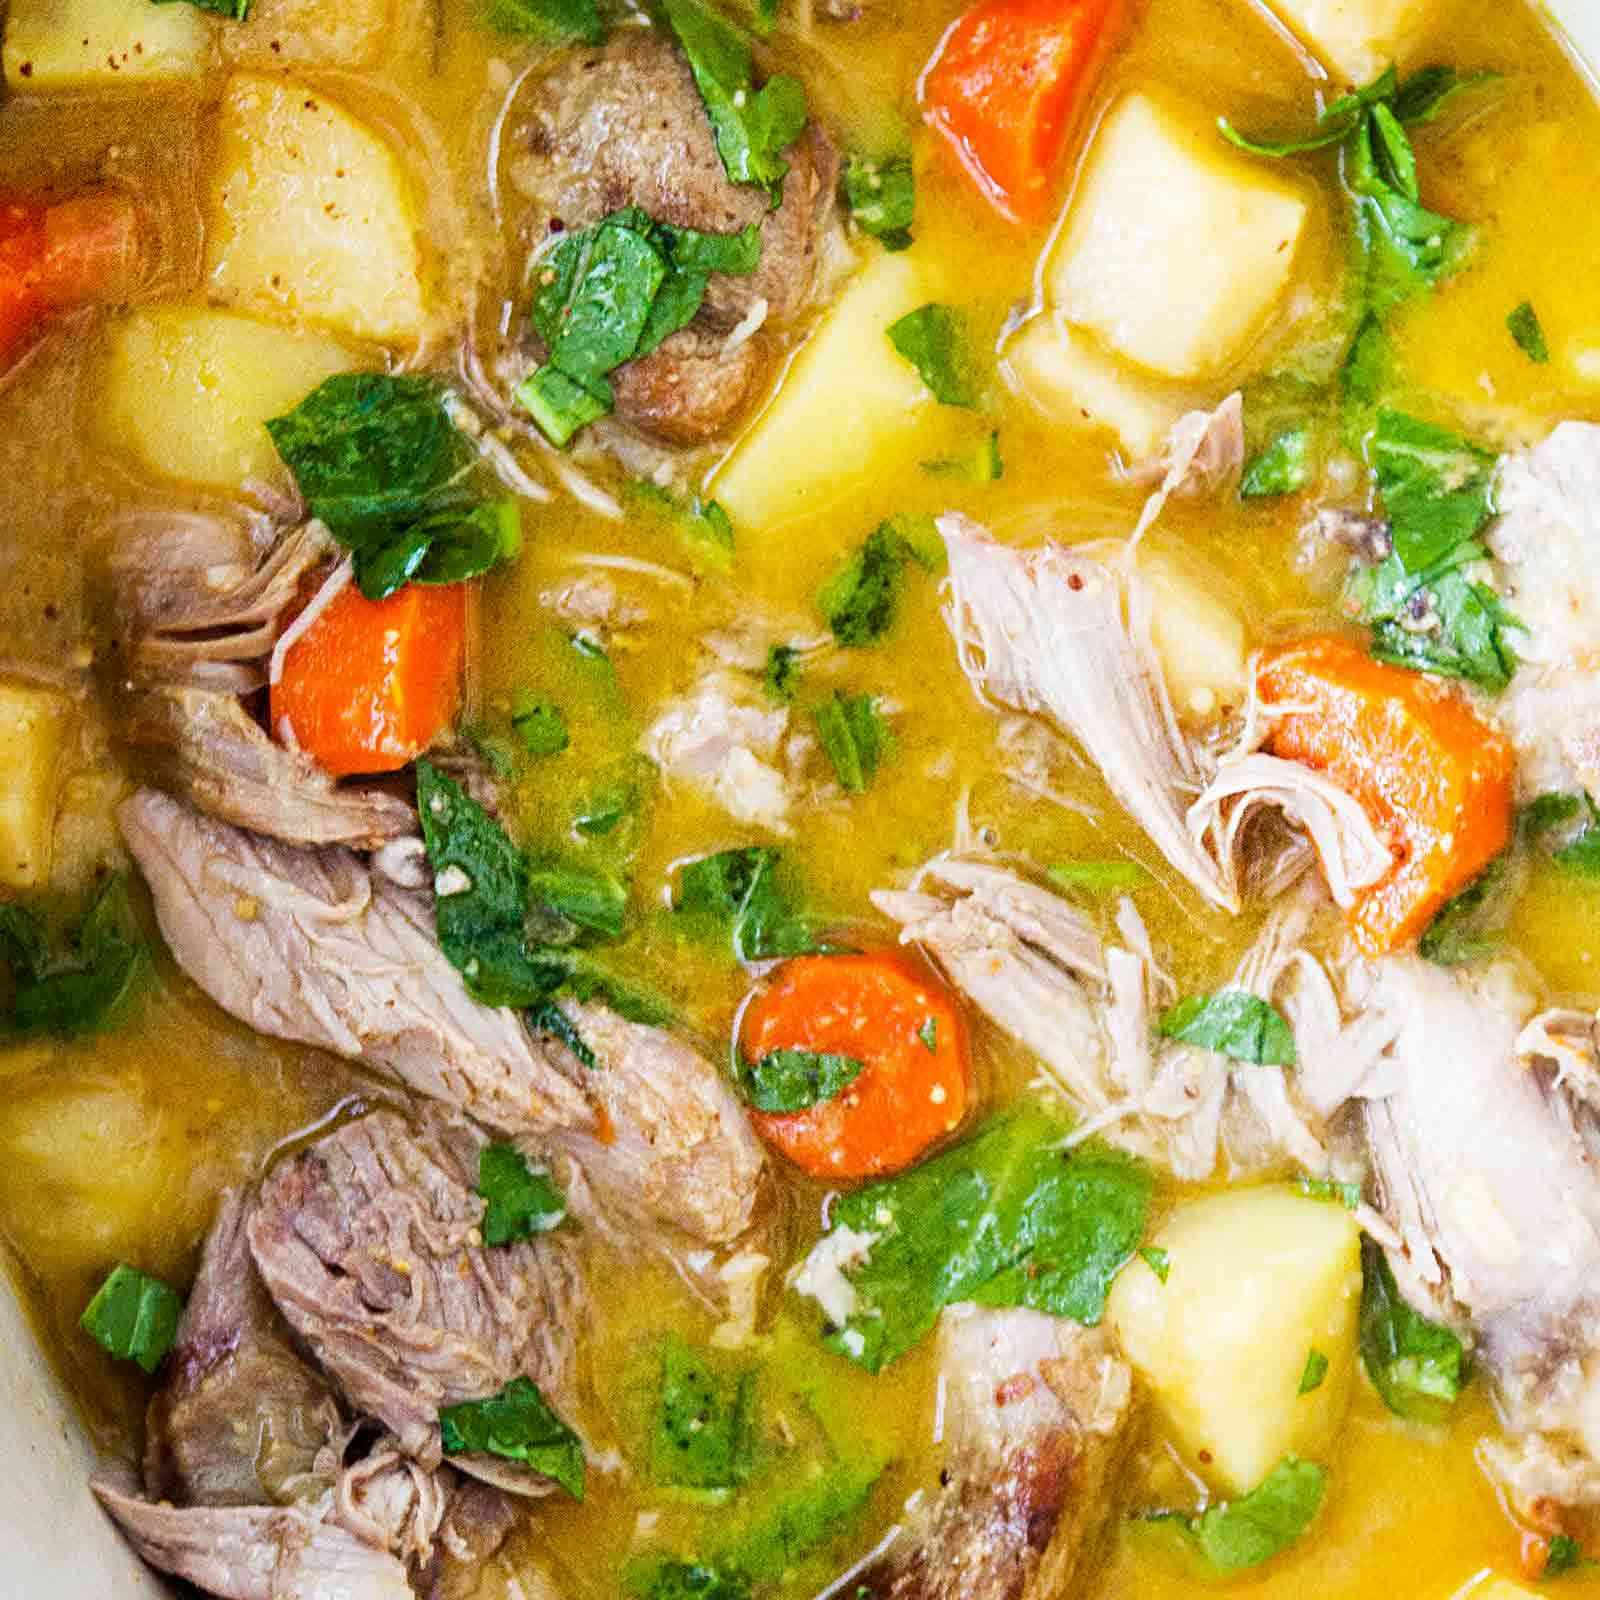 Slow Cooker Turkey Stew with Mustard